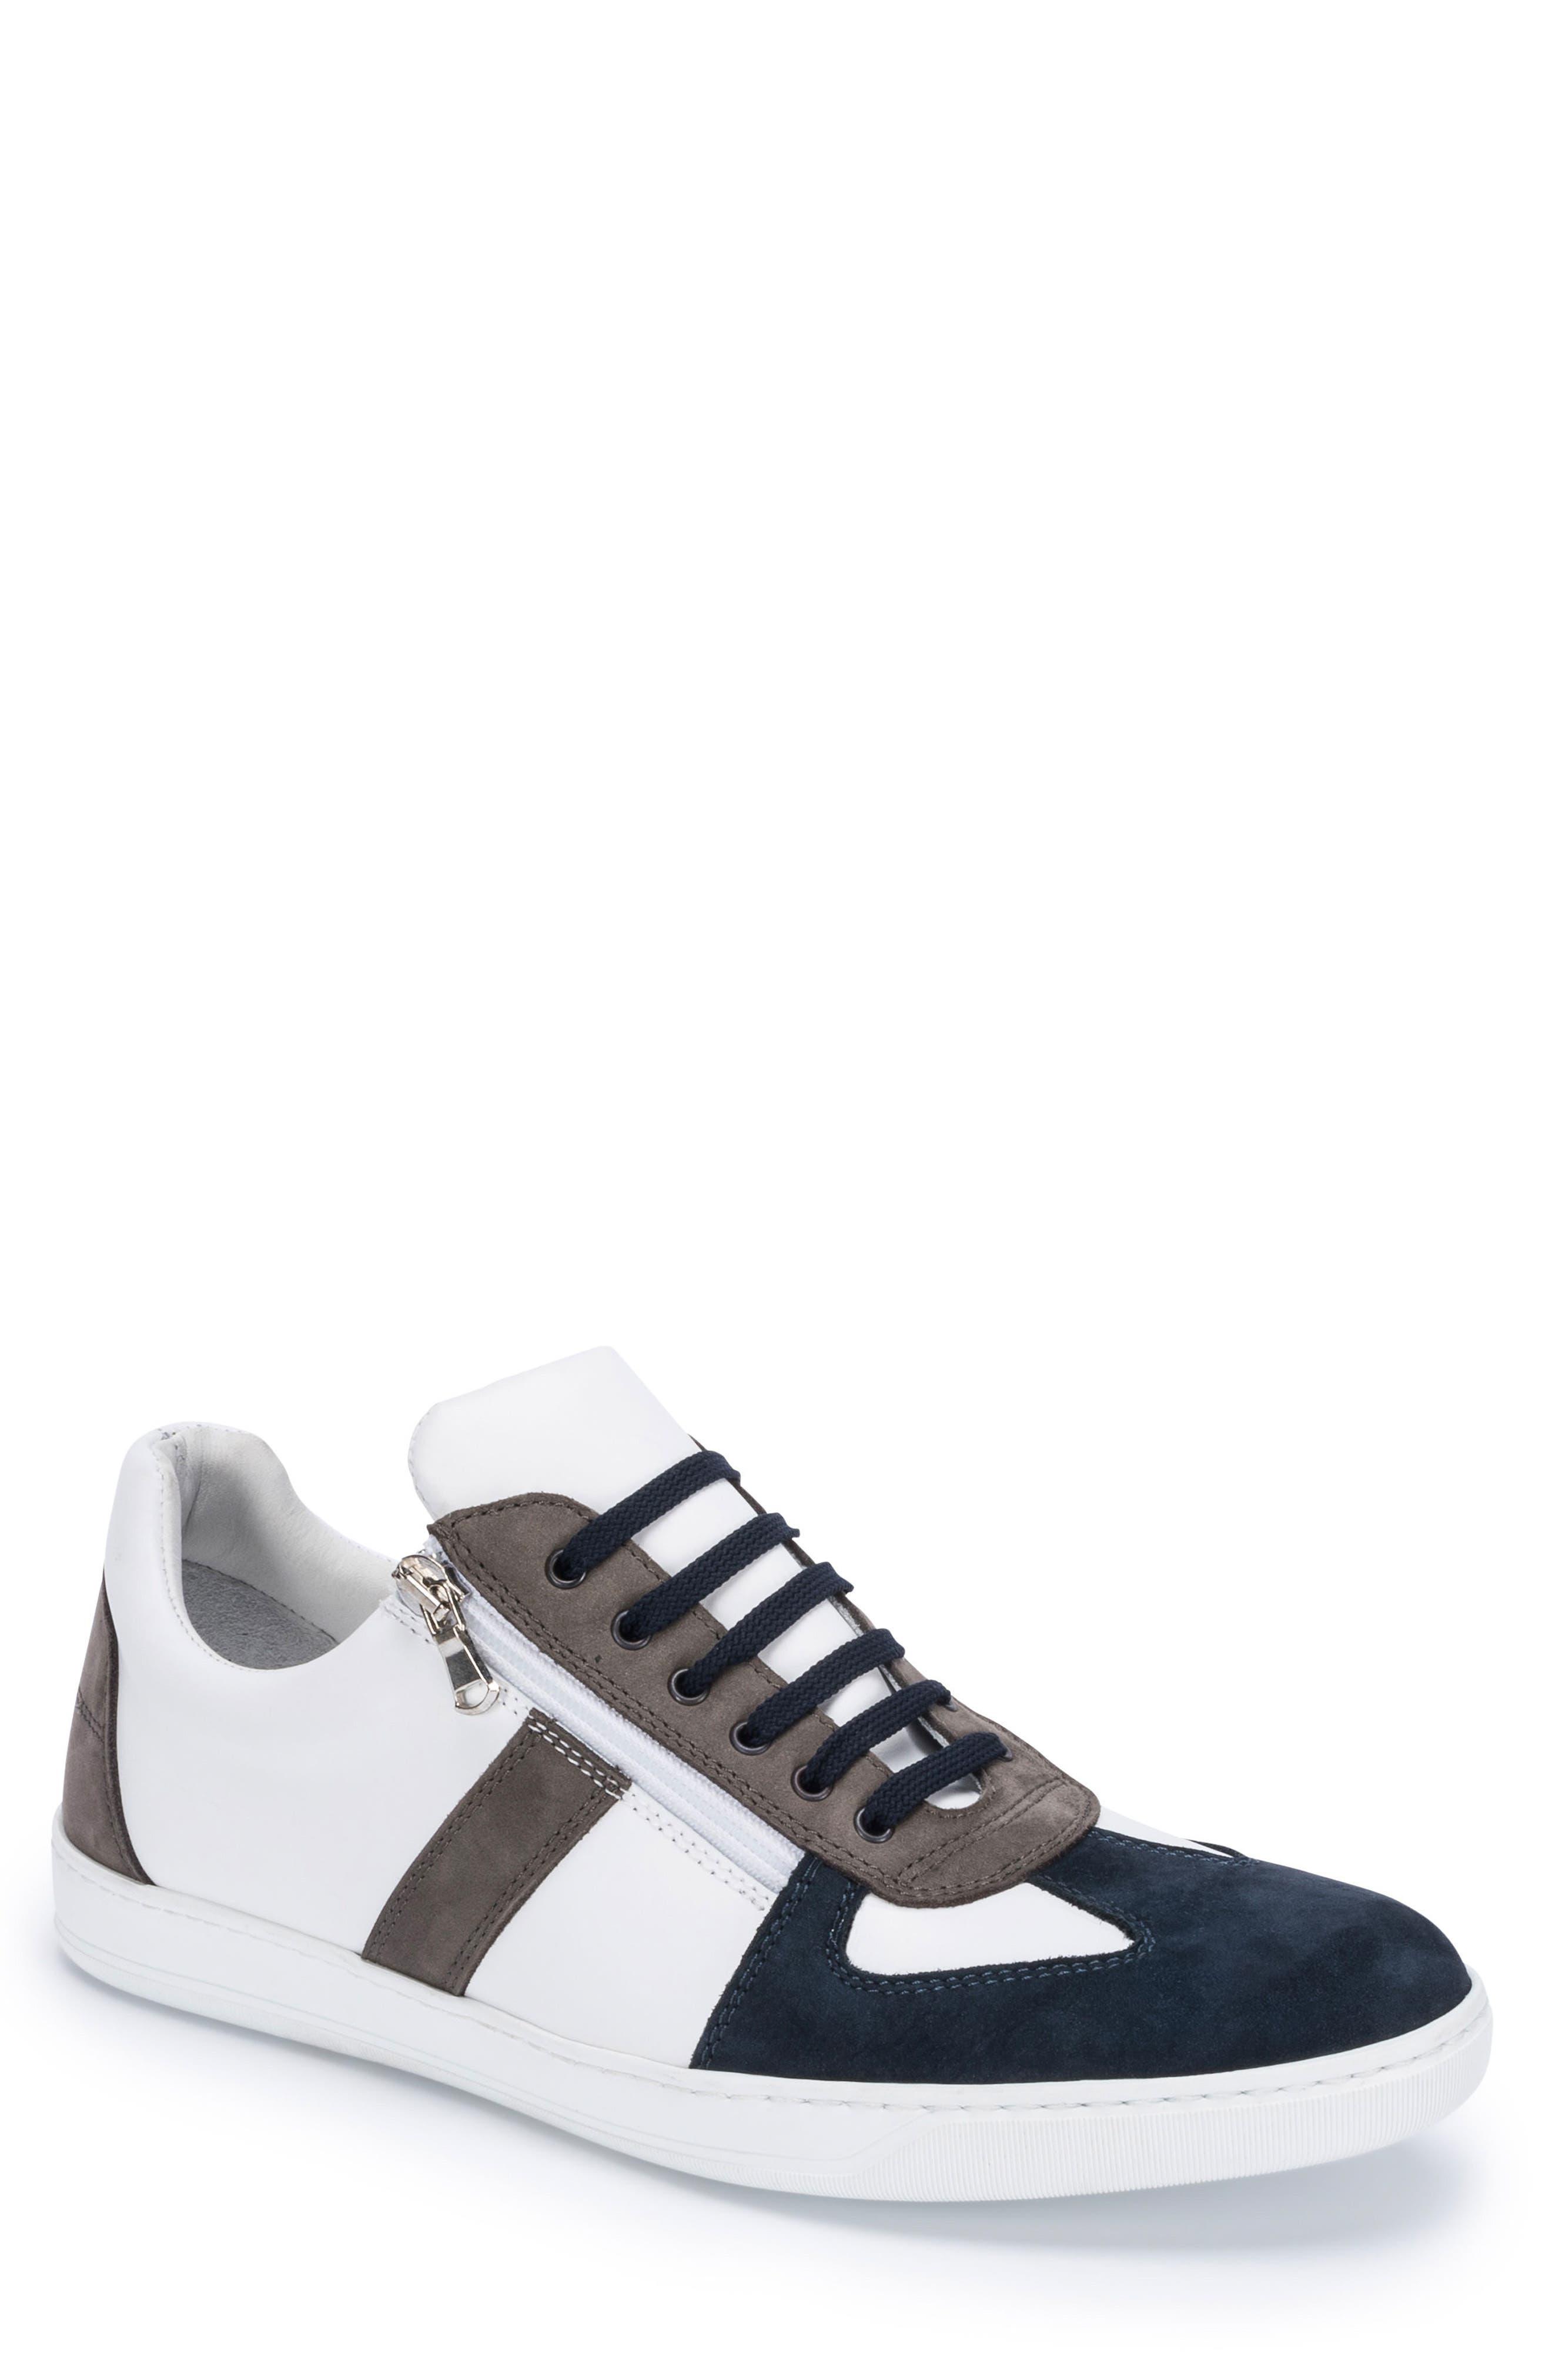 Calabria Sneaker,                         Main,                         color, White